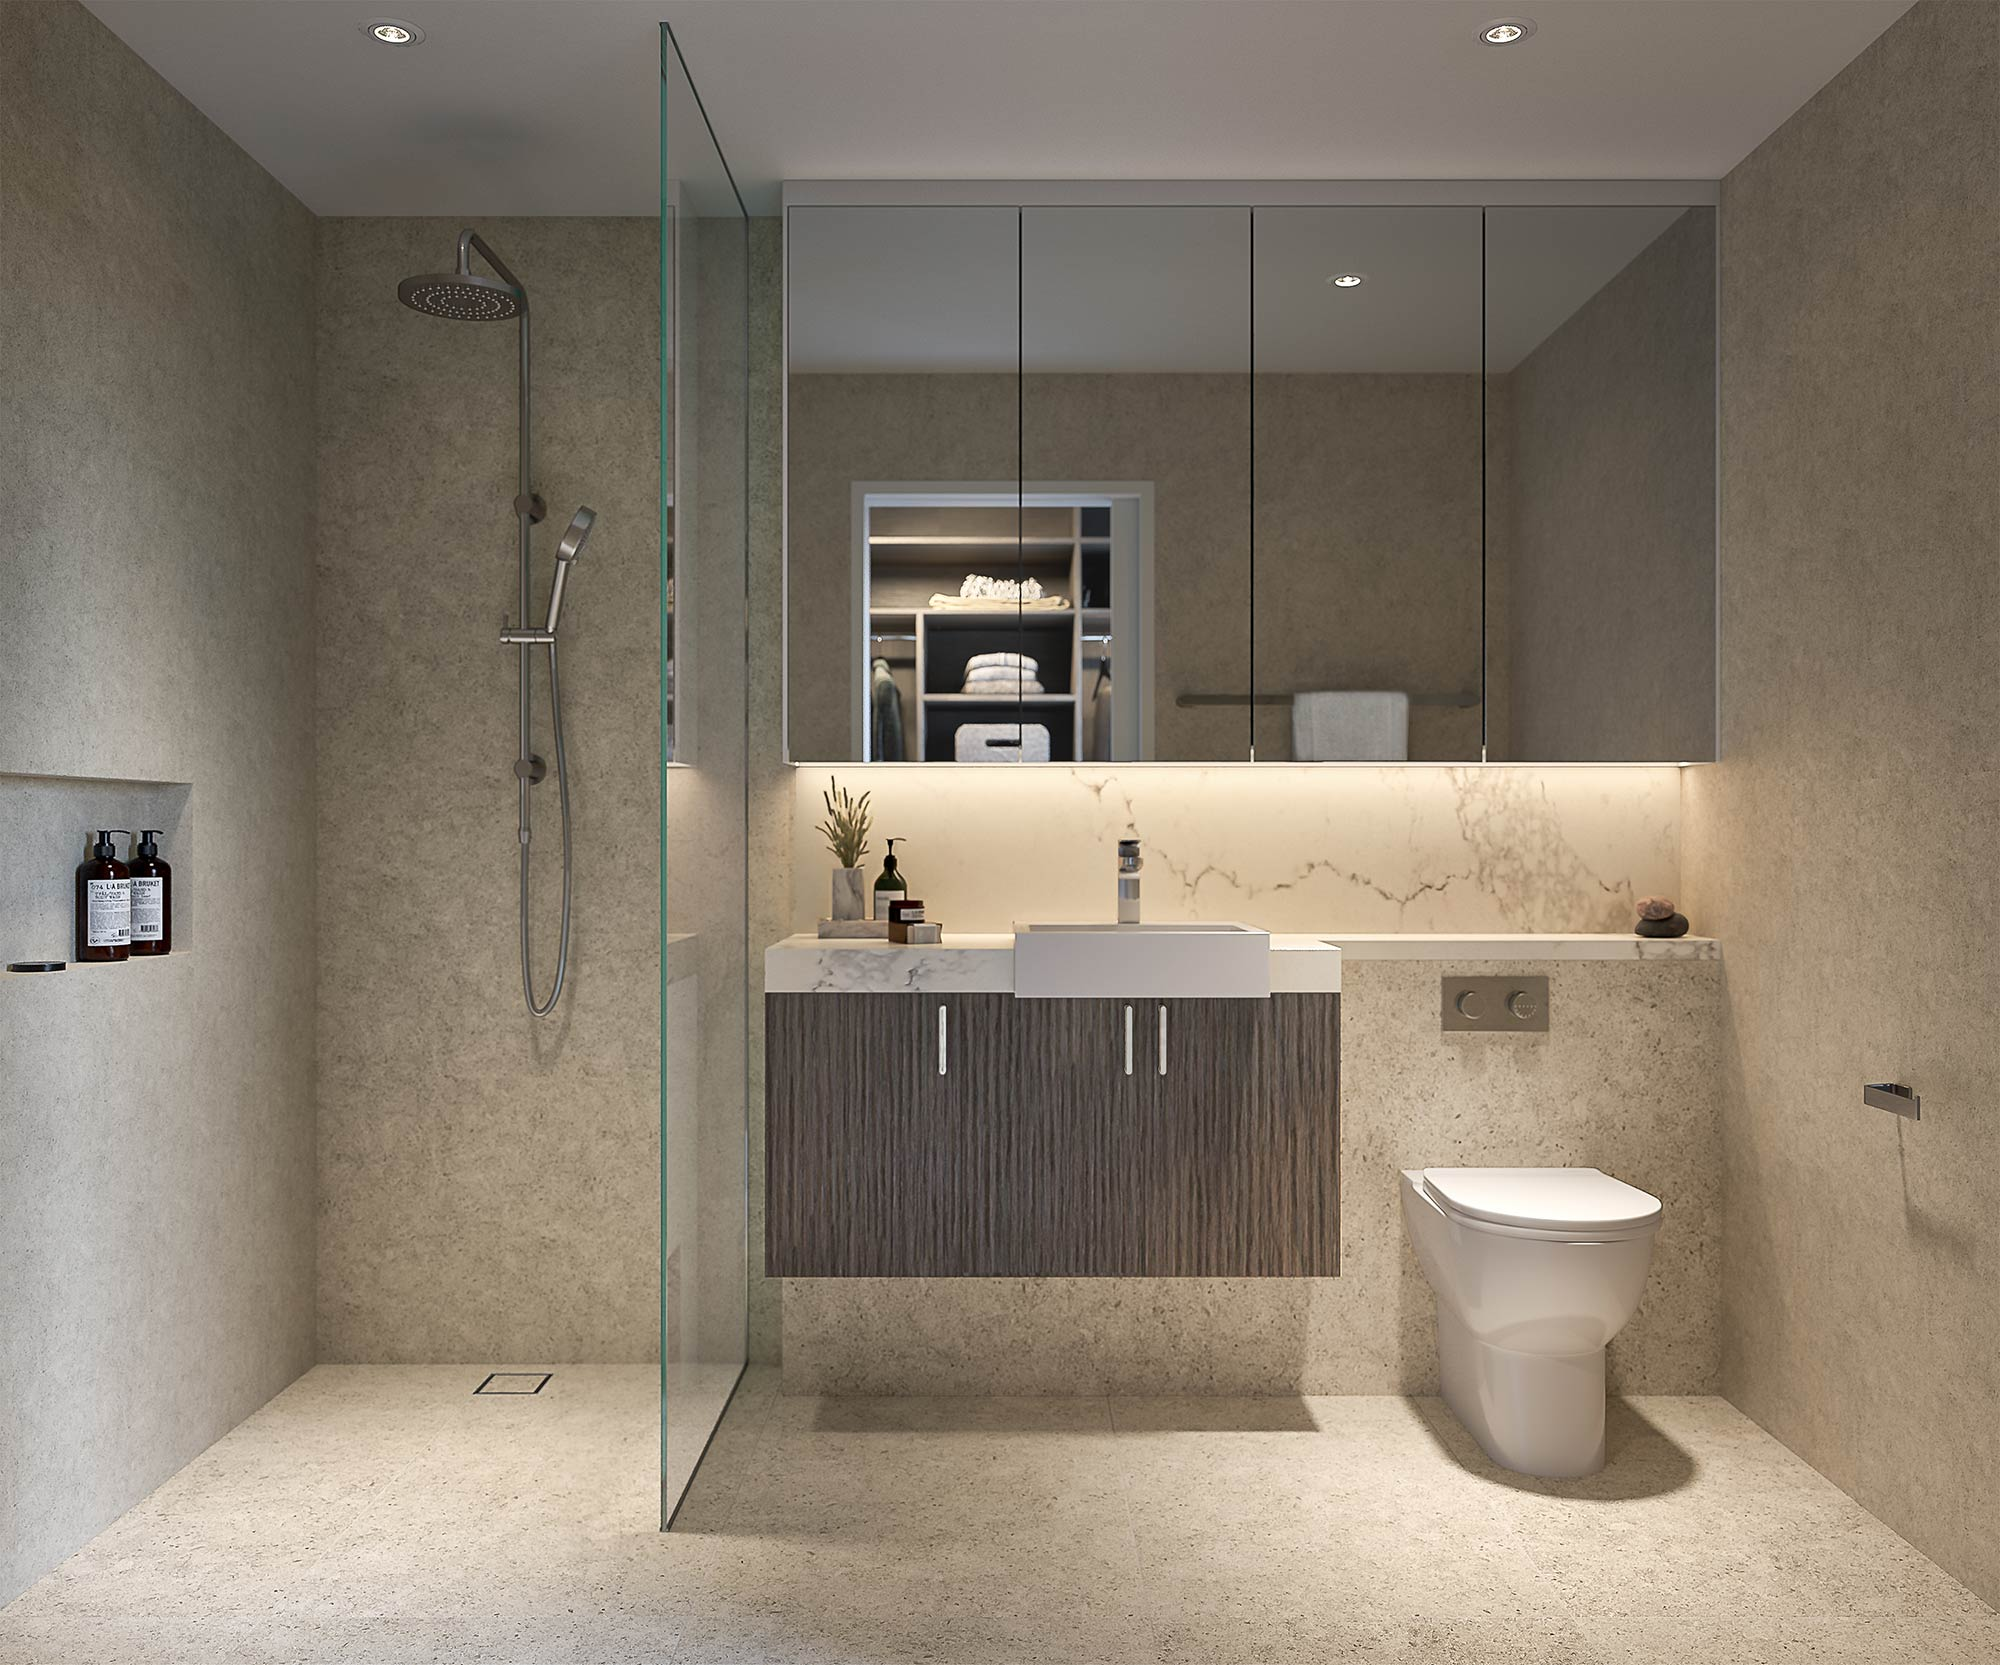 Bathroom, artist's impression at Strathalan Macleod